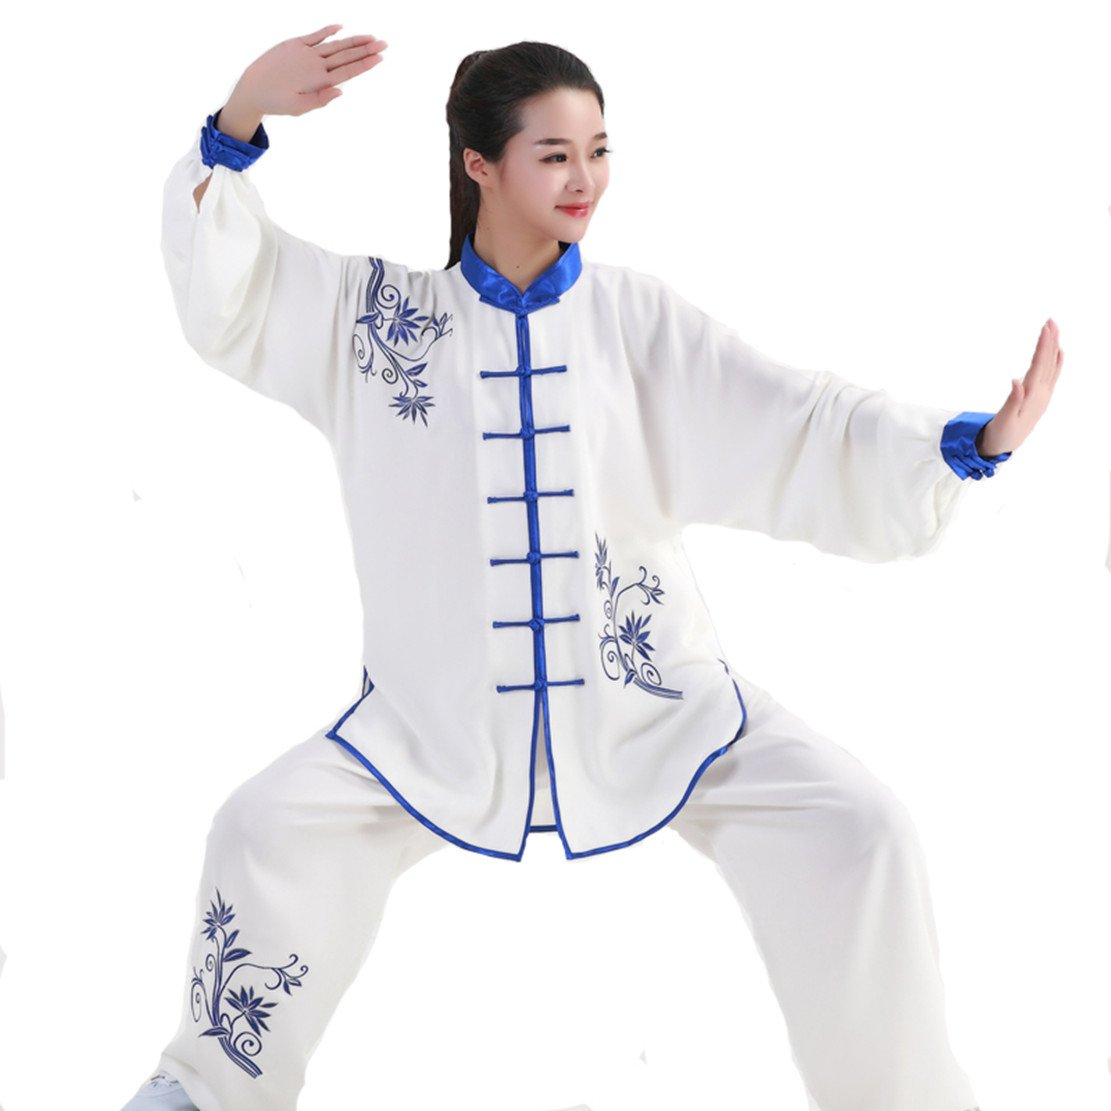 W.H.S Cotton Emboridery Tai Chi Uniform Taichi Clothes Martial Arts Kung fu Suits Taiji Trainning Clothes Tang Suits CHINA